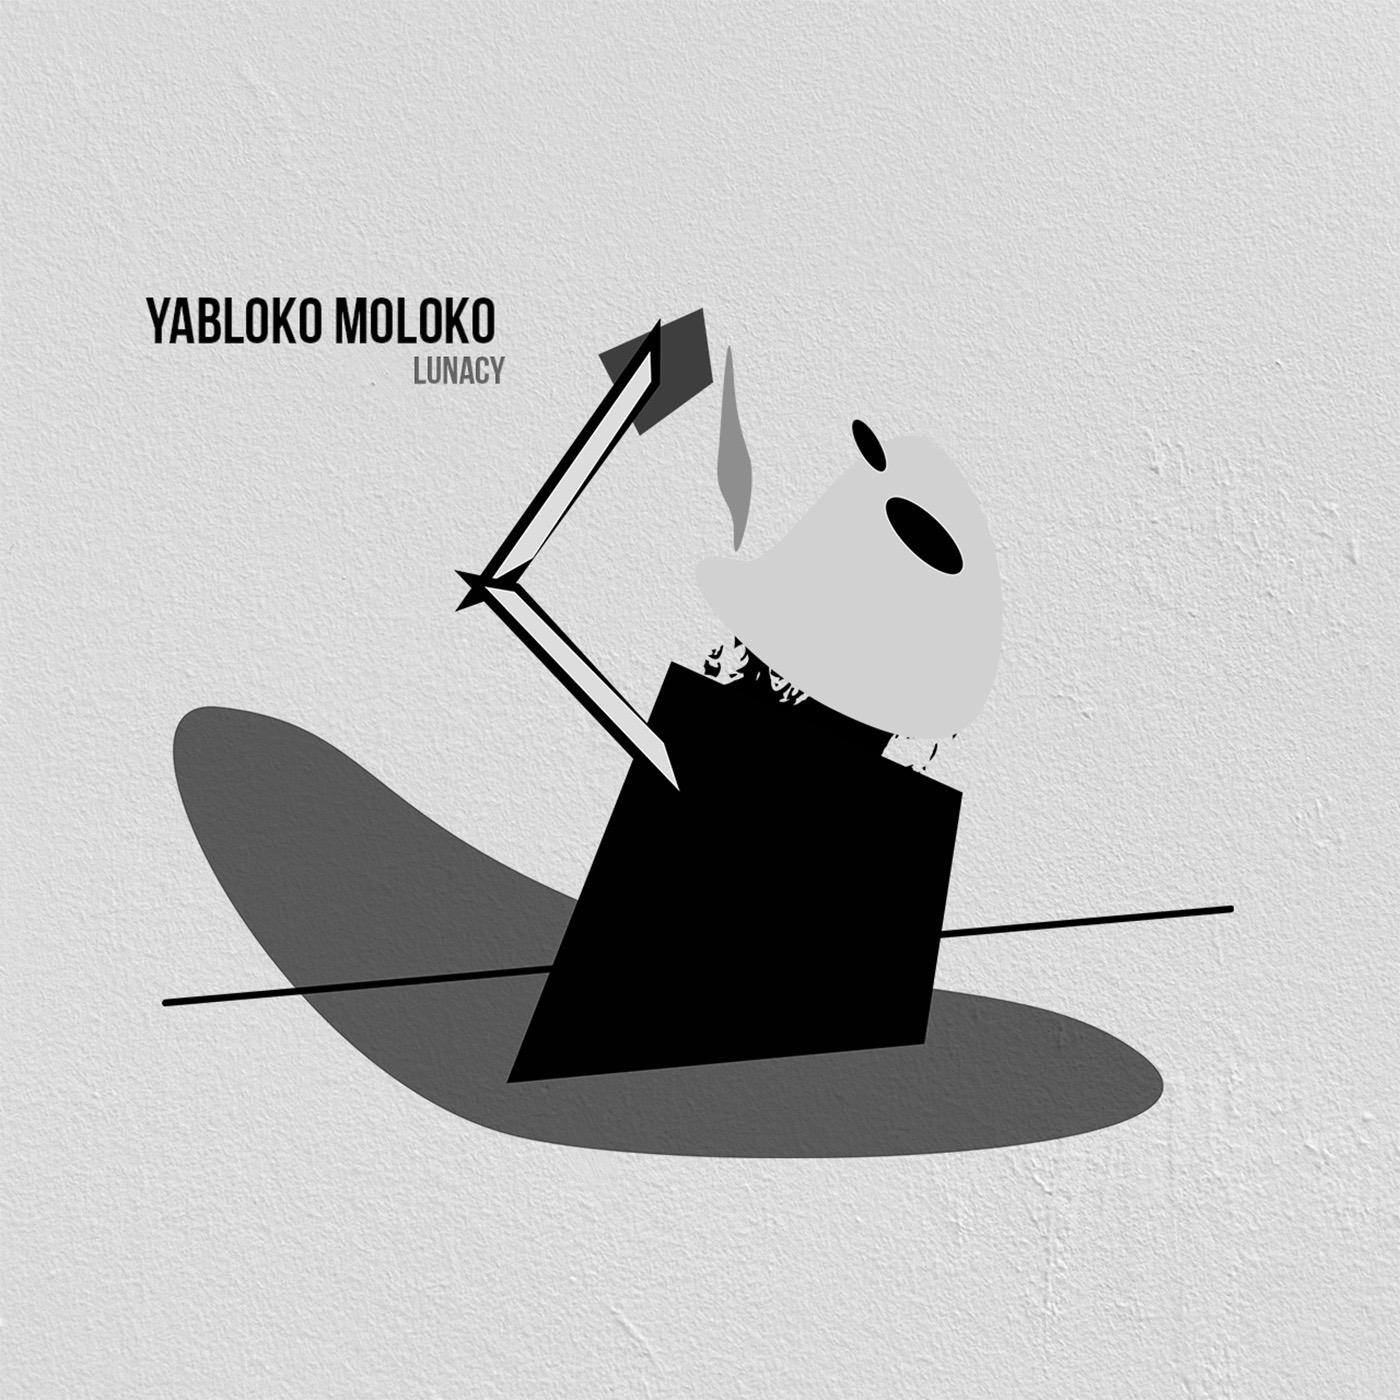 Lunacy Artwork - Electro Swing by Yabloko Moloko from Barcelona